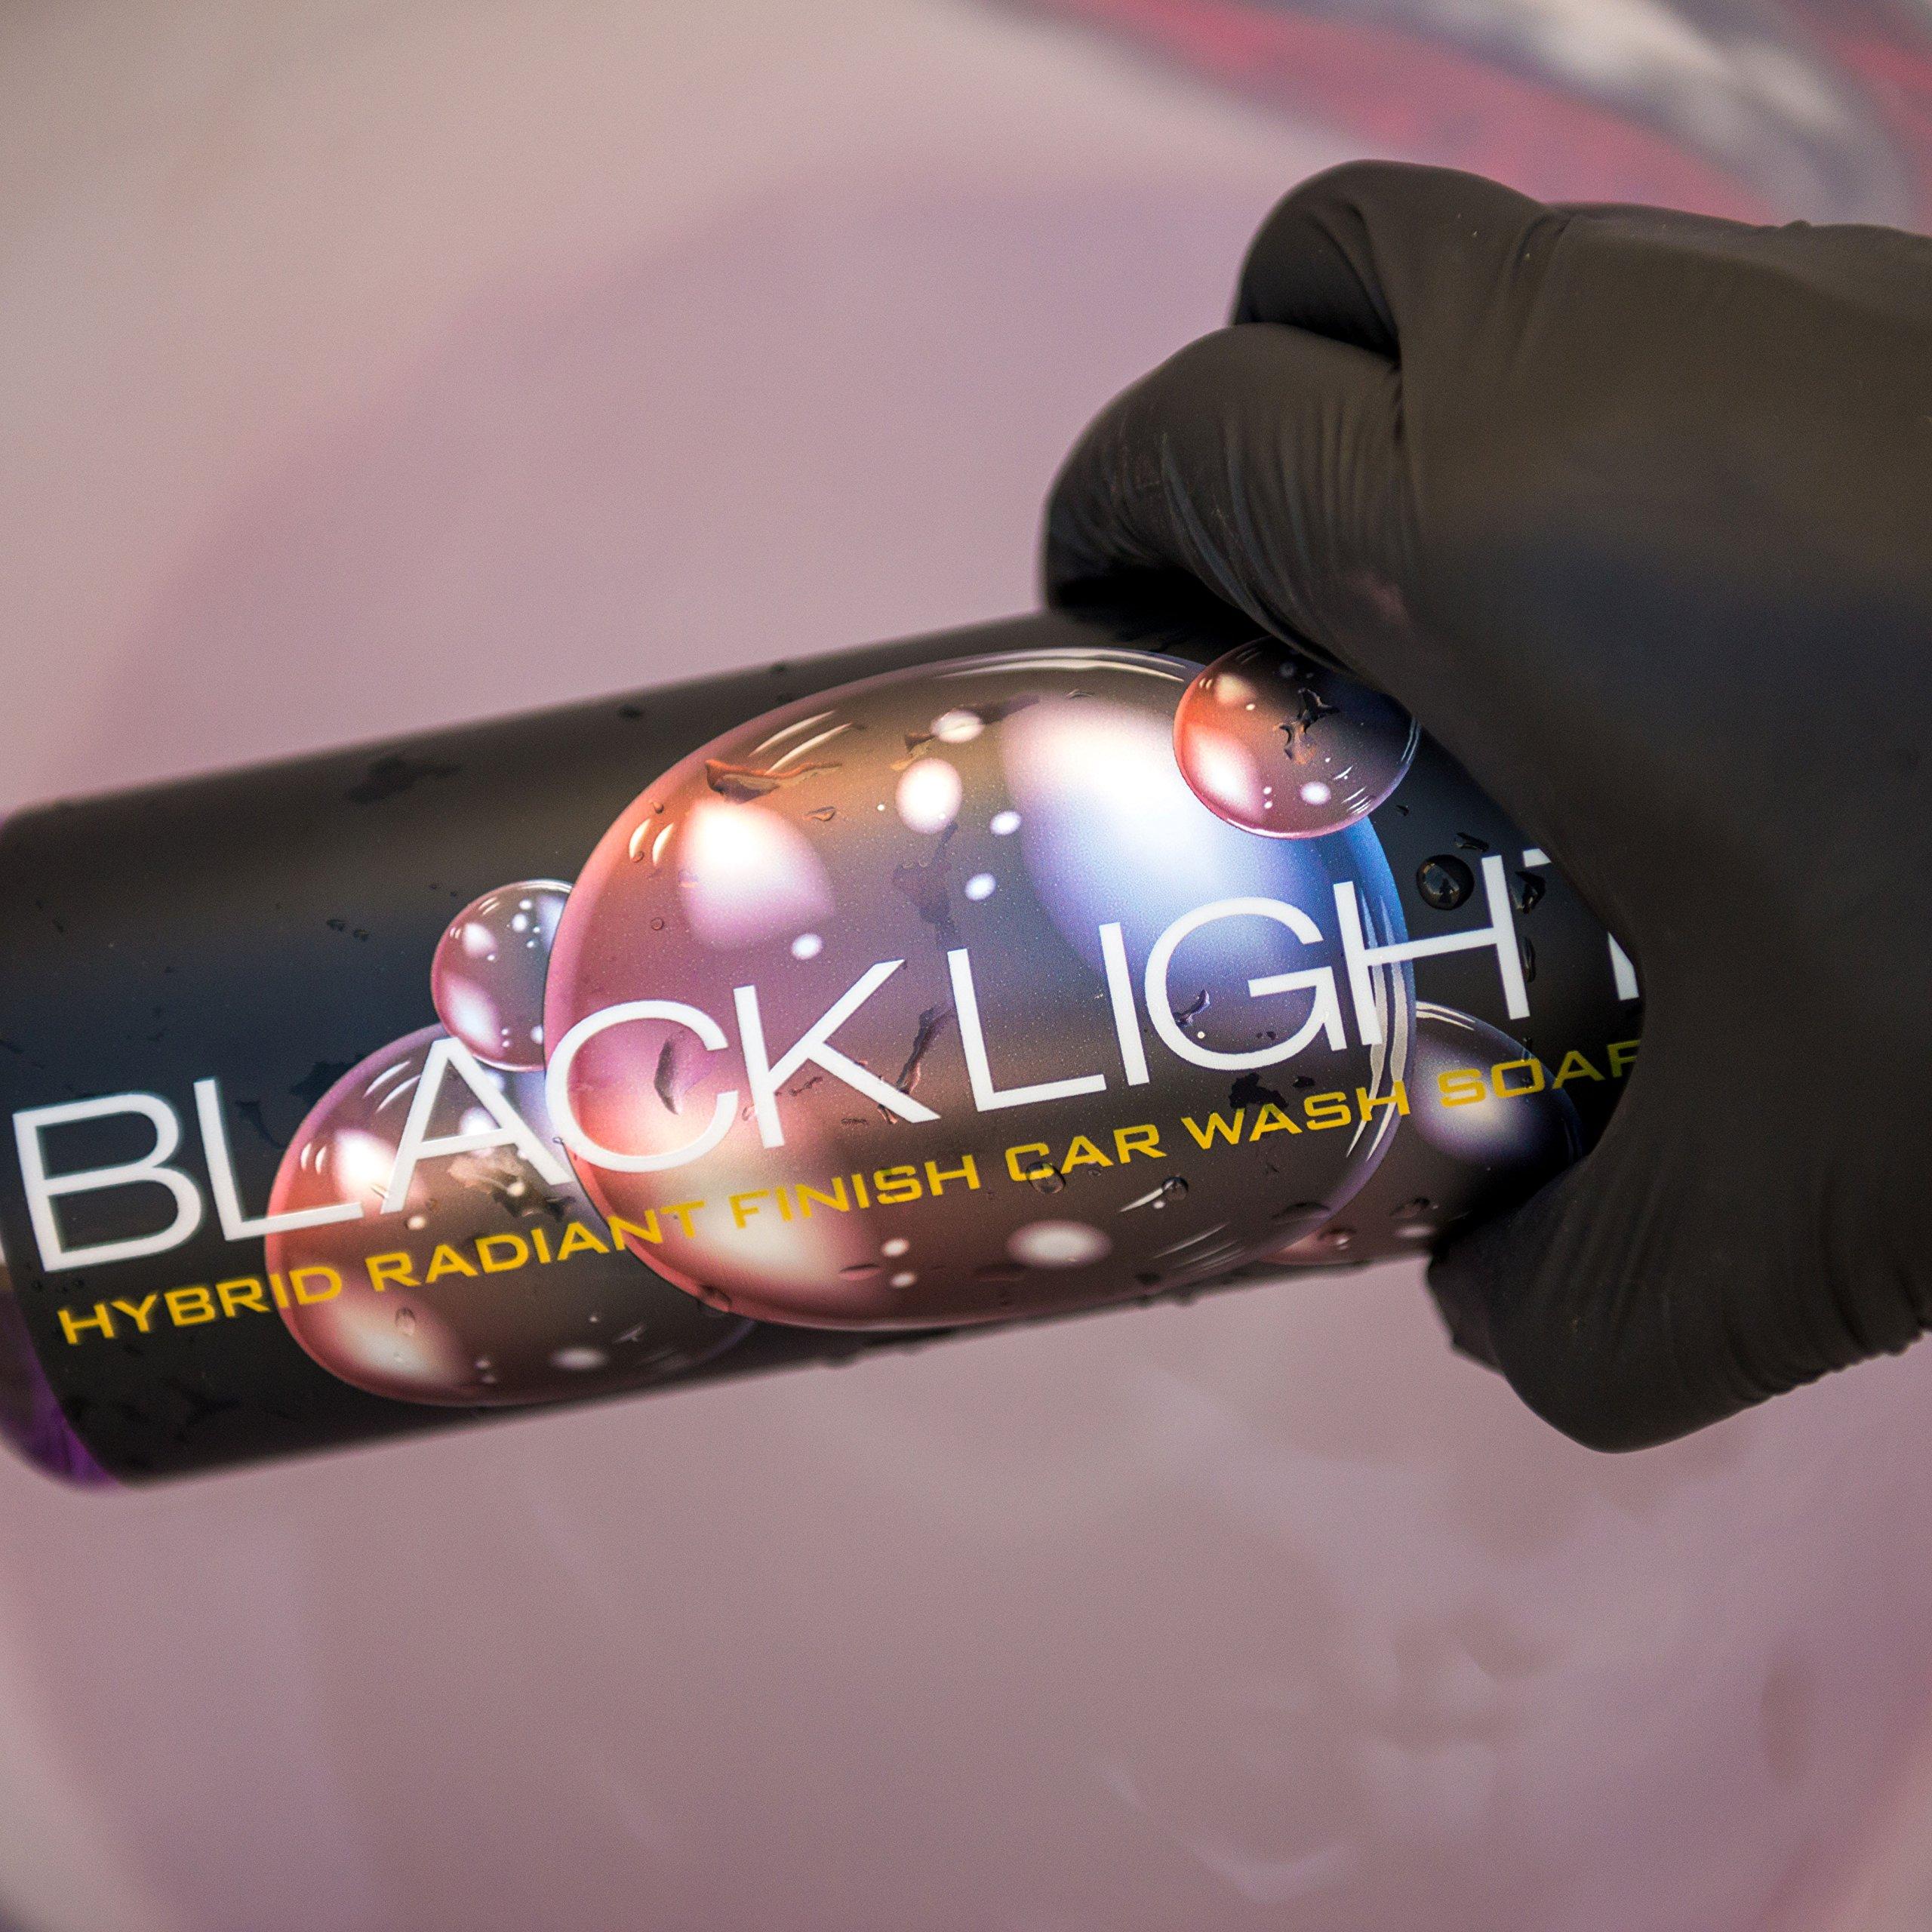 Chemical Guys CWS61964 Black Light Hybrid Radiant Finish Car Wash Soap (64 oz - 1/2 Gallon) by Chemical Guys (Image #3)